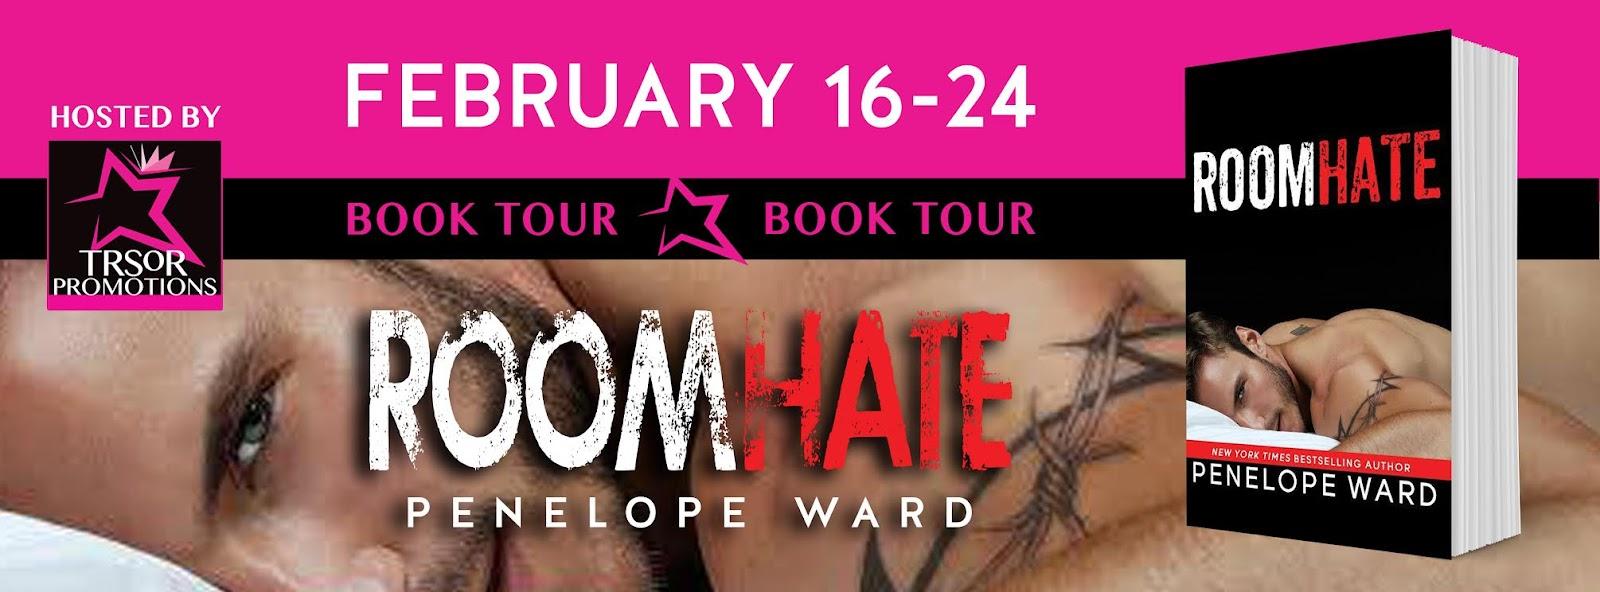 roomhate book tour.jpg